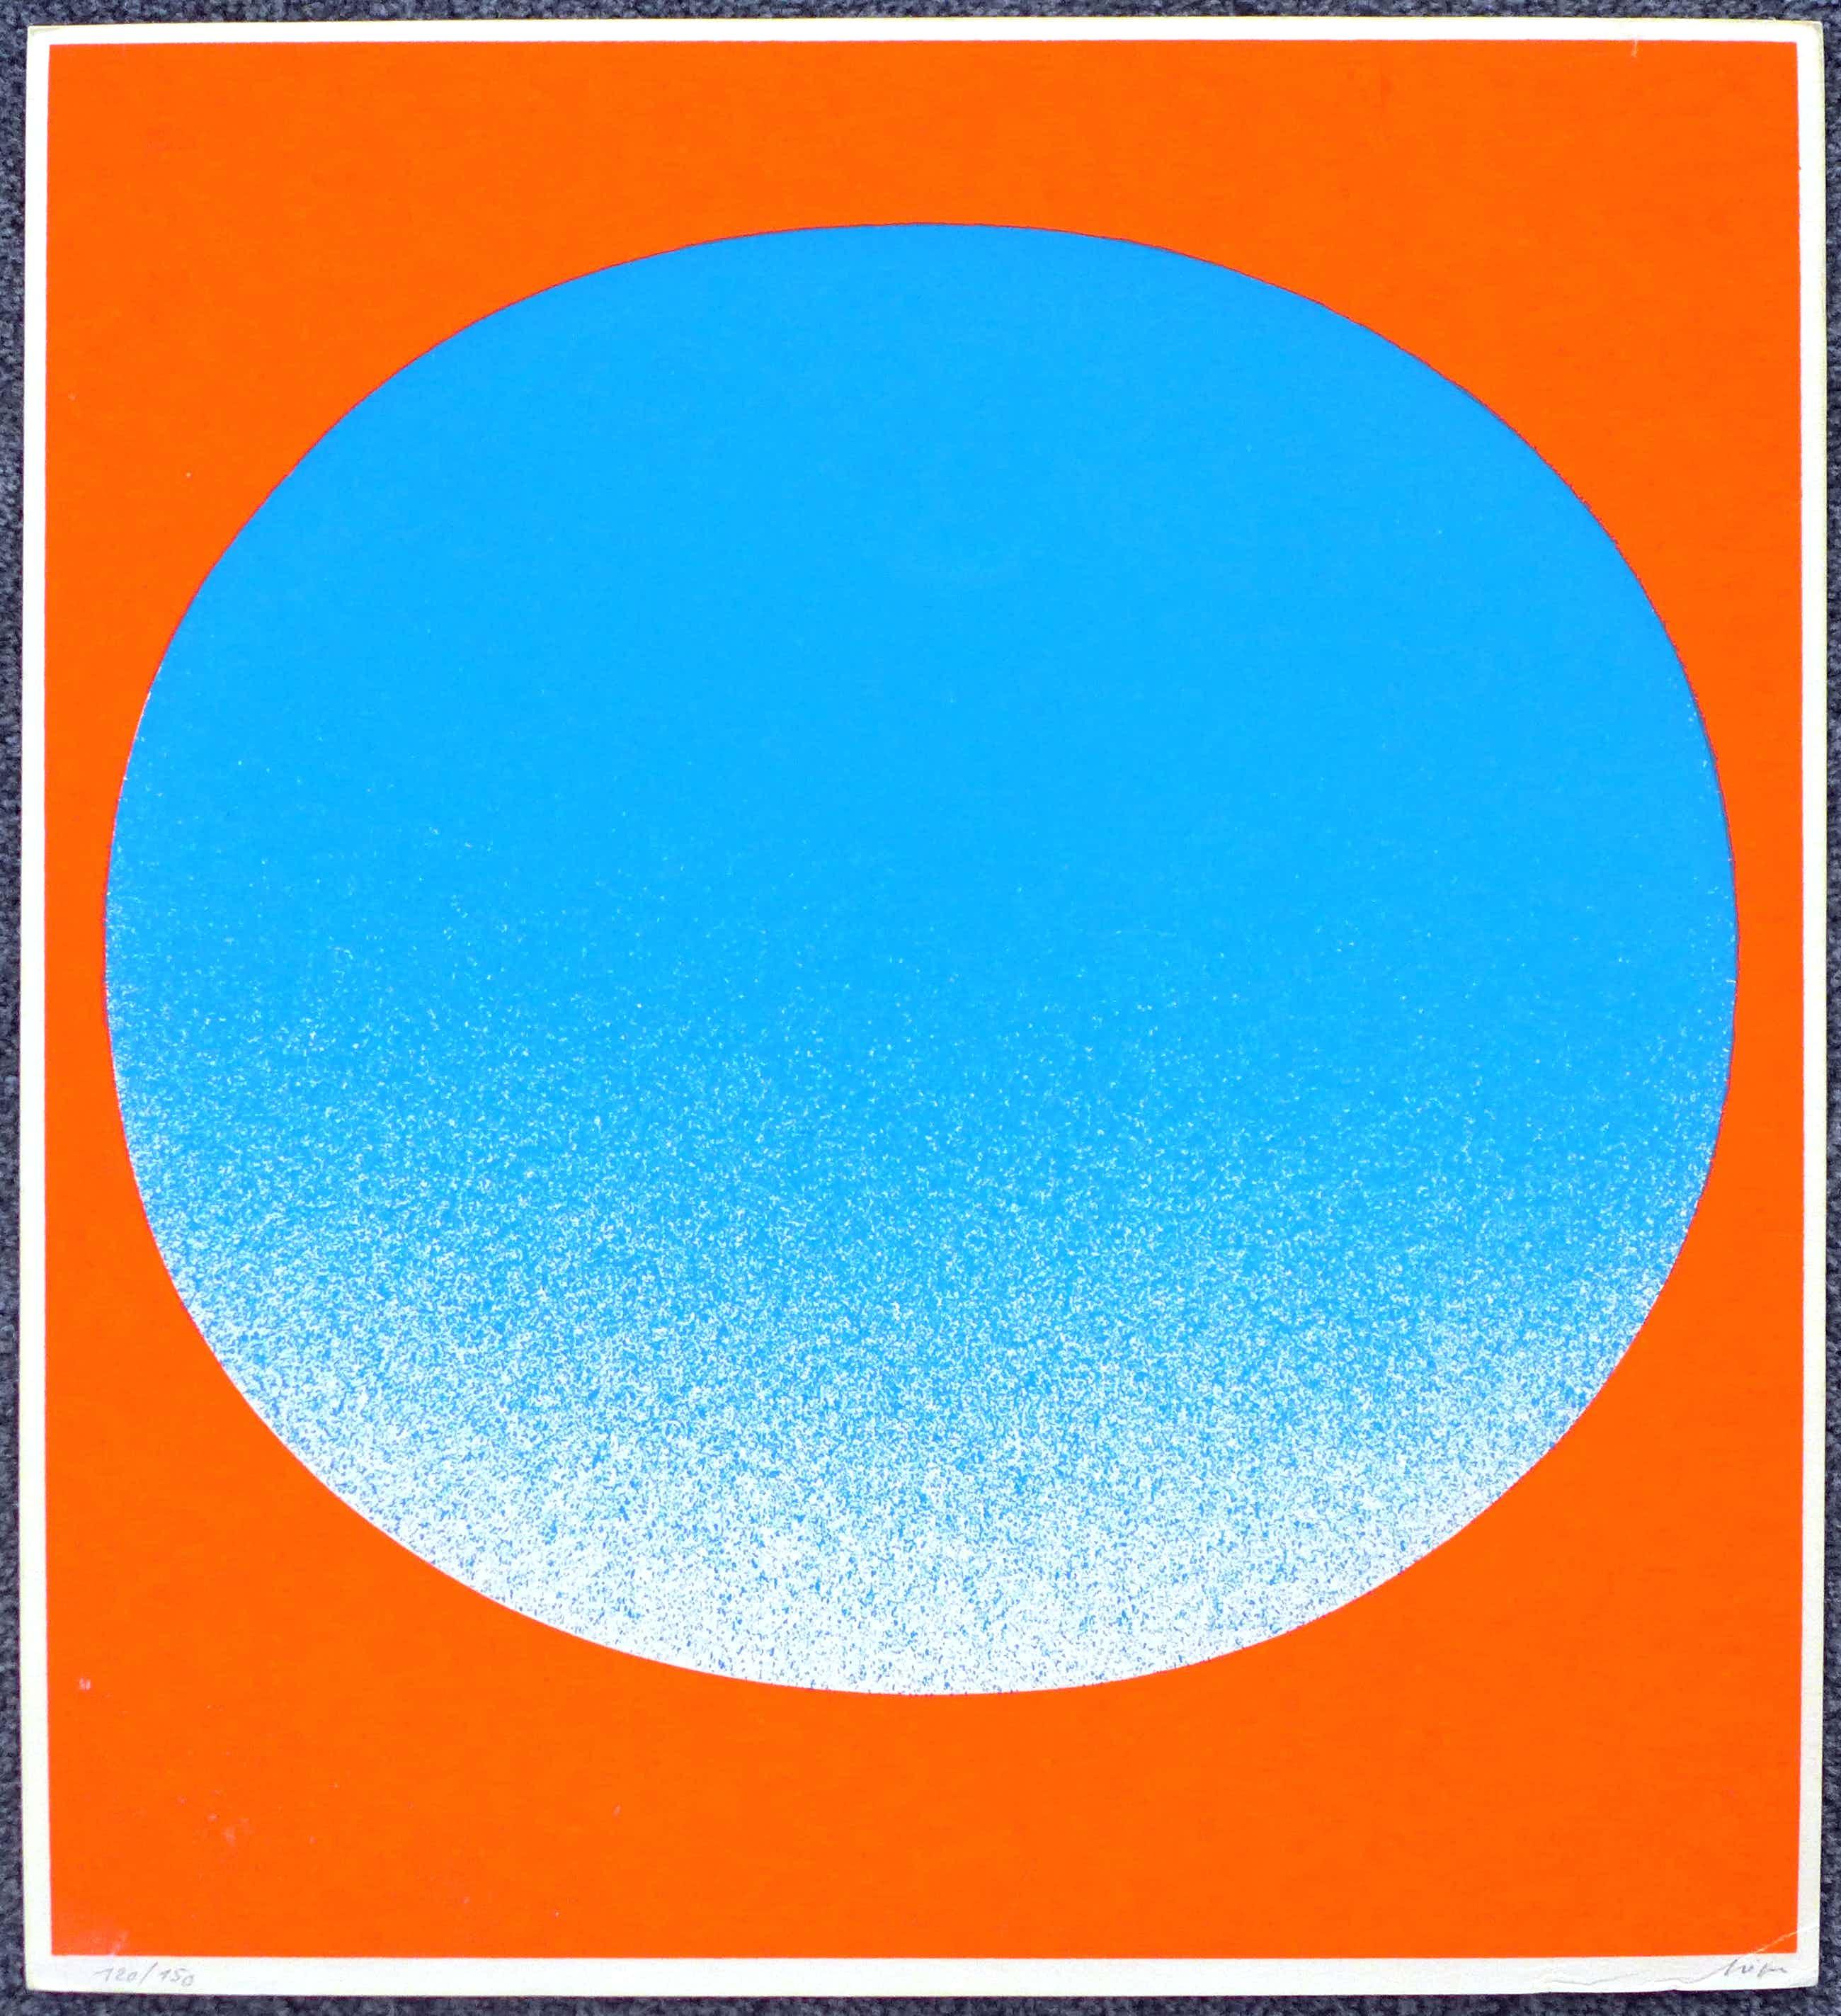 Rupprecht Geiger - ohne Titel, Neon-Farbserigraphie kopen? Bied vanaf 120!